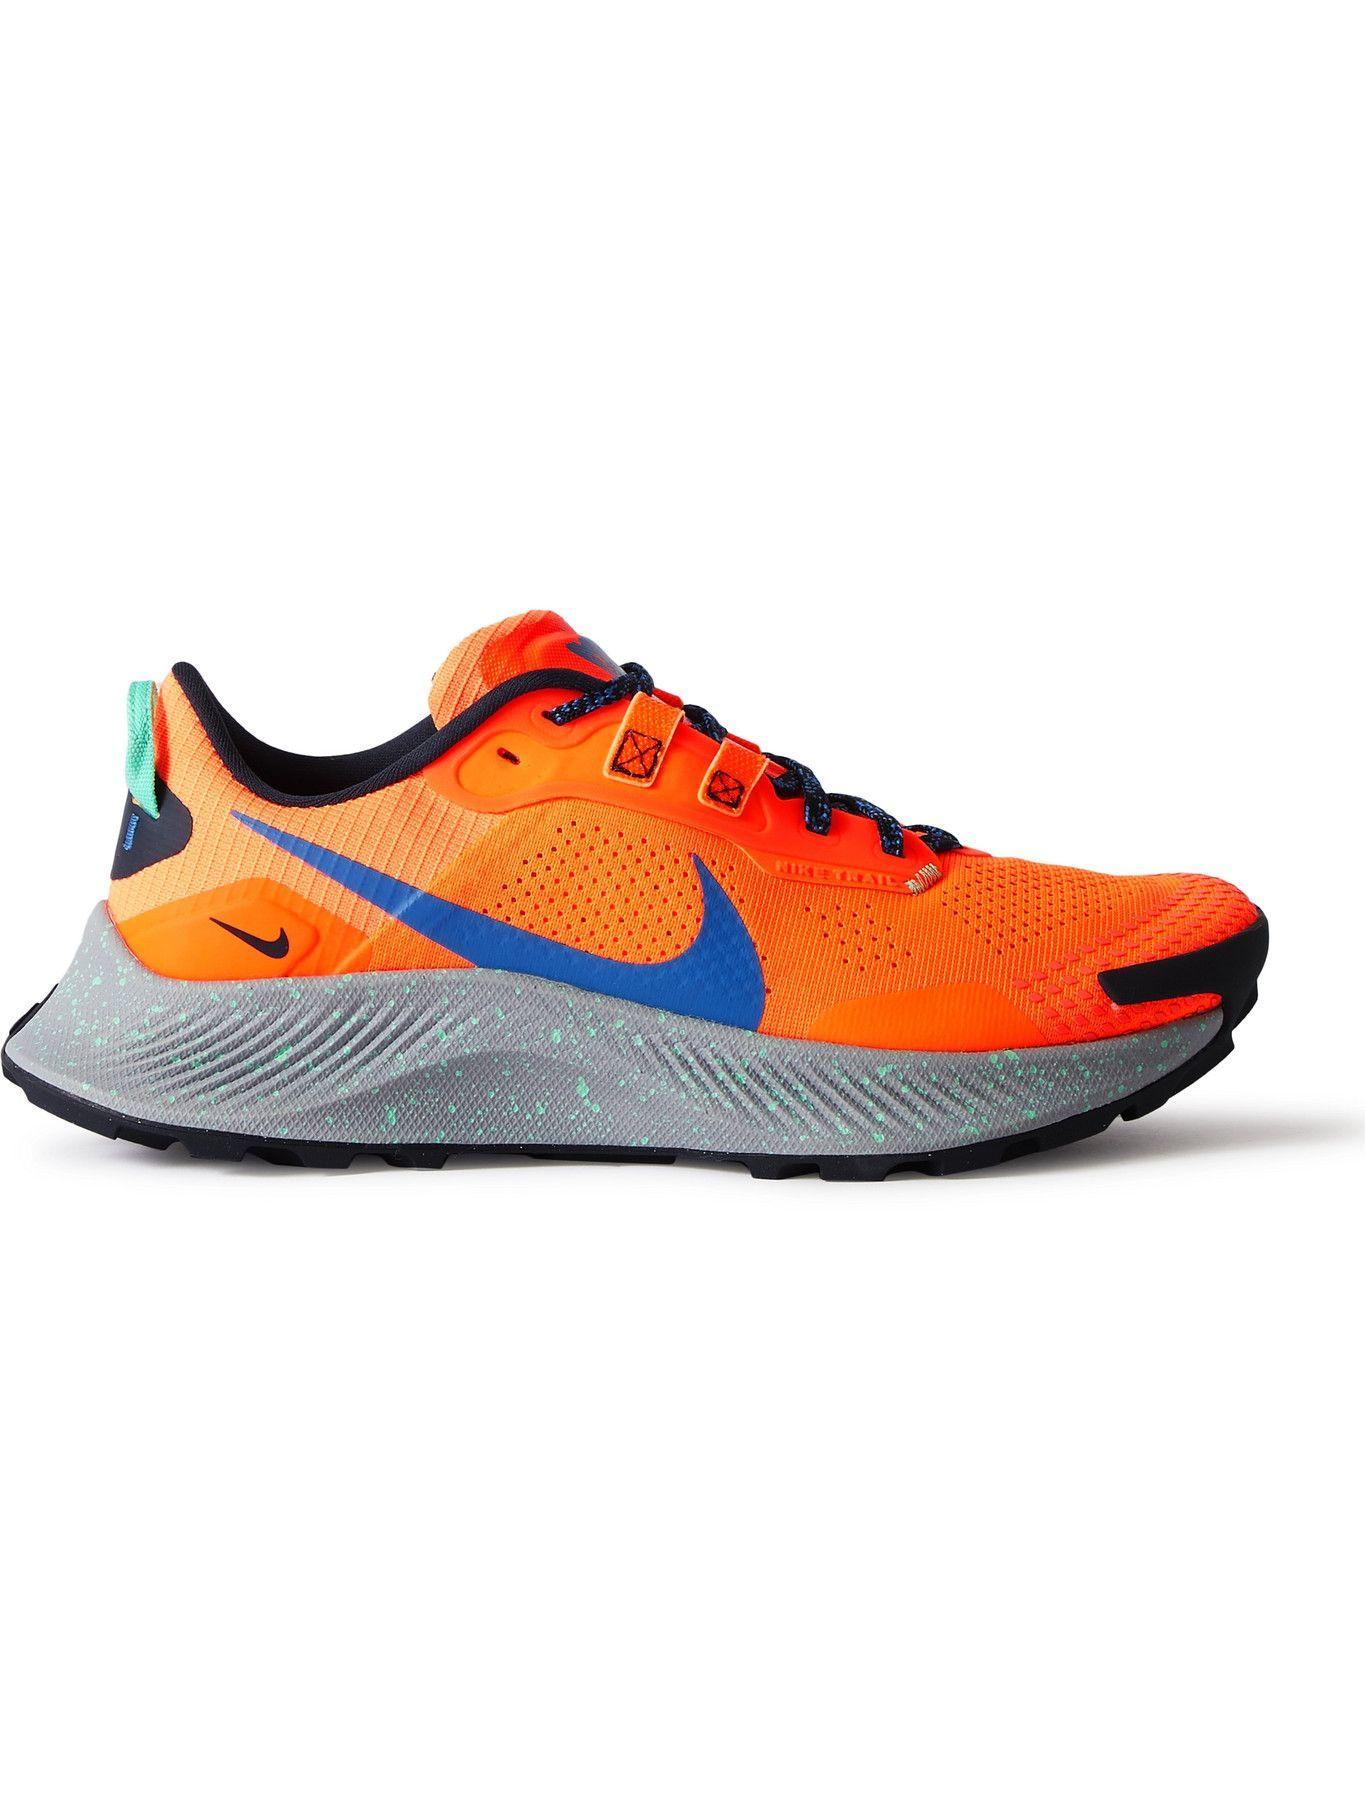 Photo: Nike Running - Pegasus Trail 3 Mesh and Rubber Running Sneakers - Orange